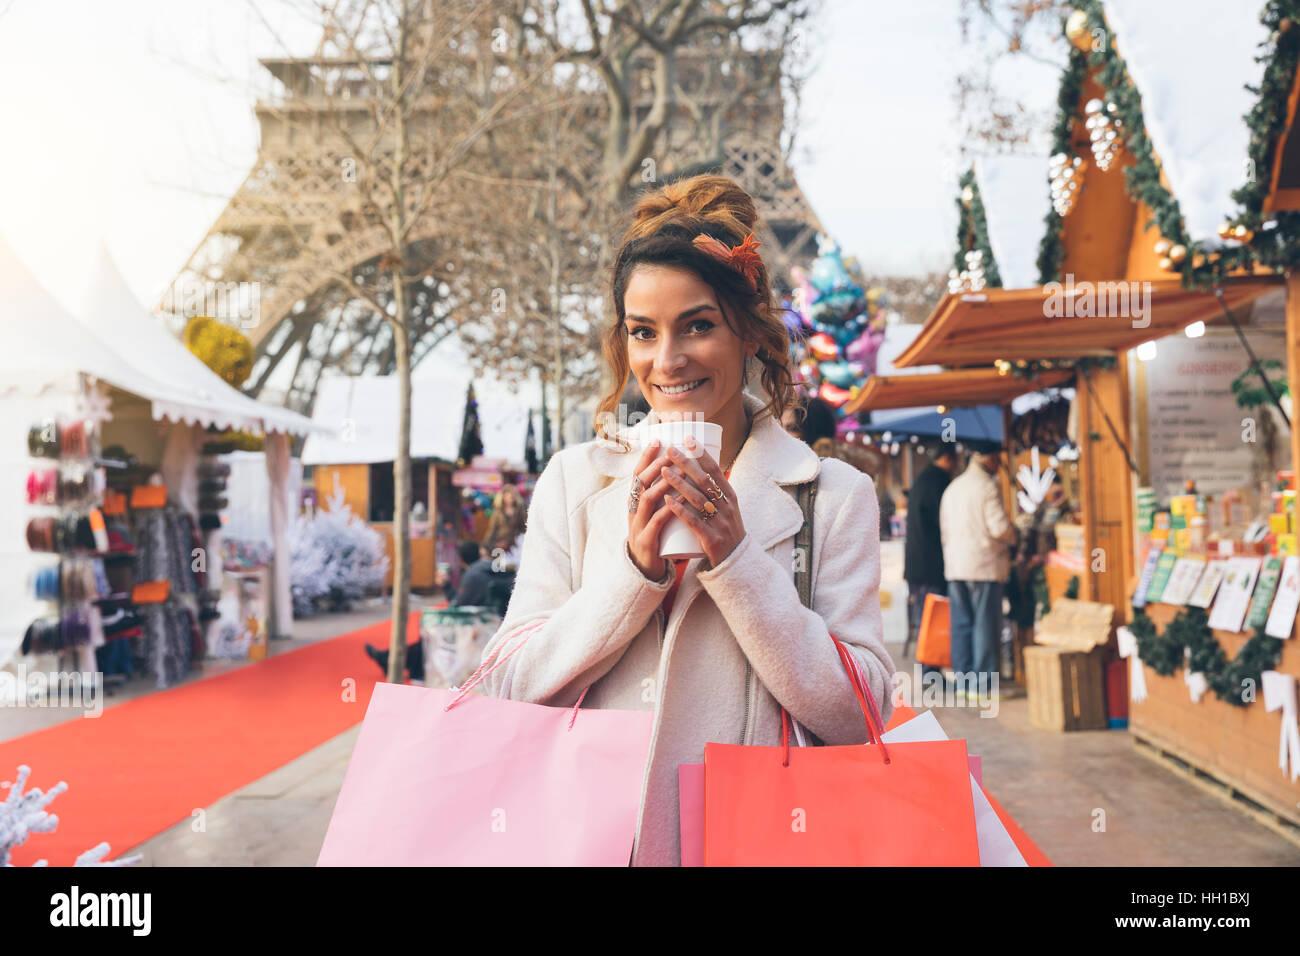 Paris, Woman doing shopping in Christmas market - Stock Image